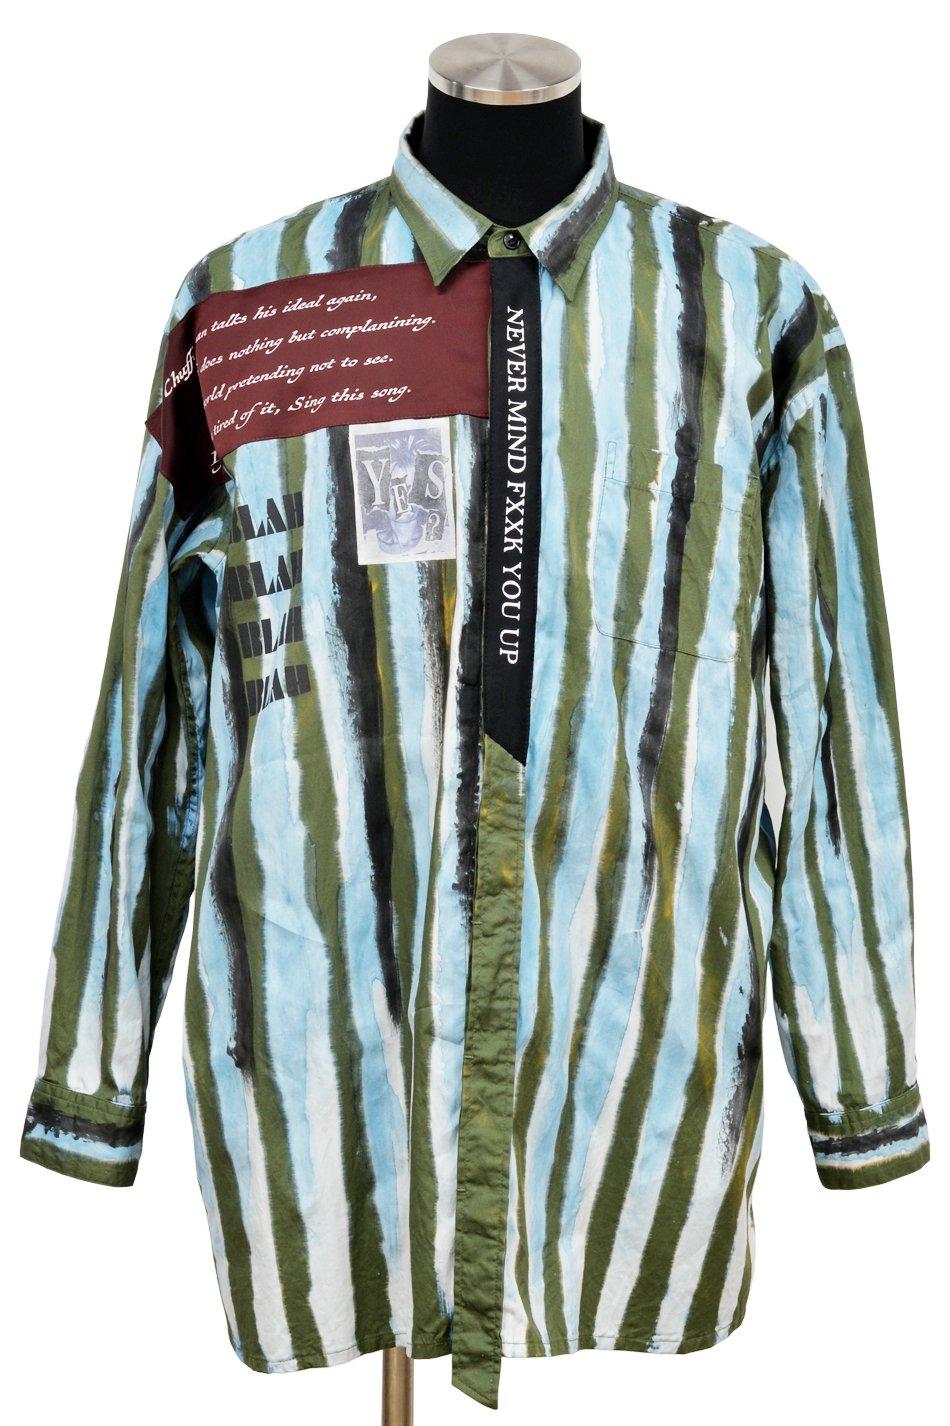 JOHNNY BUSINESS(ジョニービジネス )Anarchy Shirt